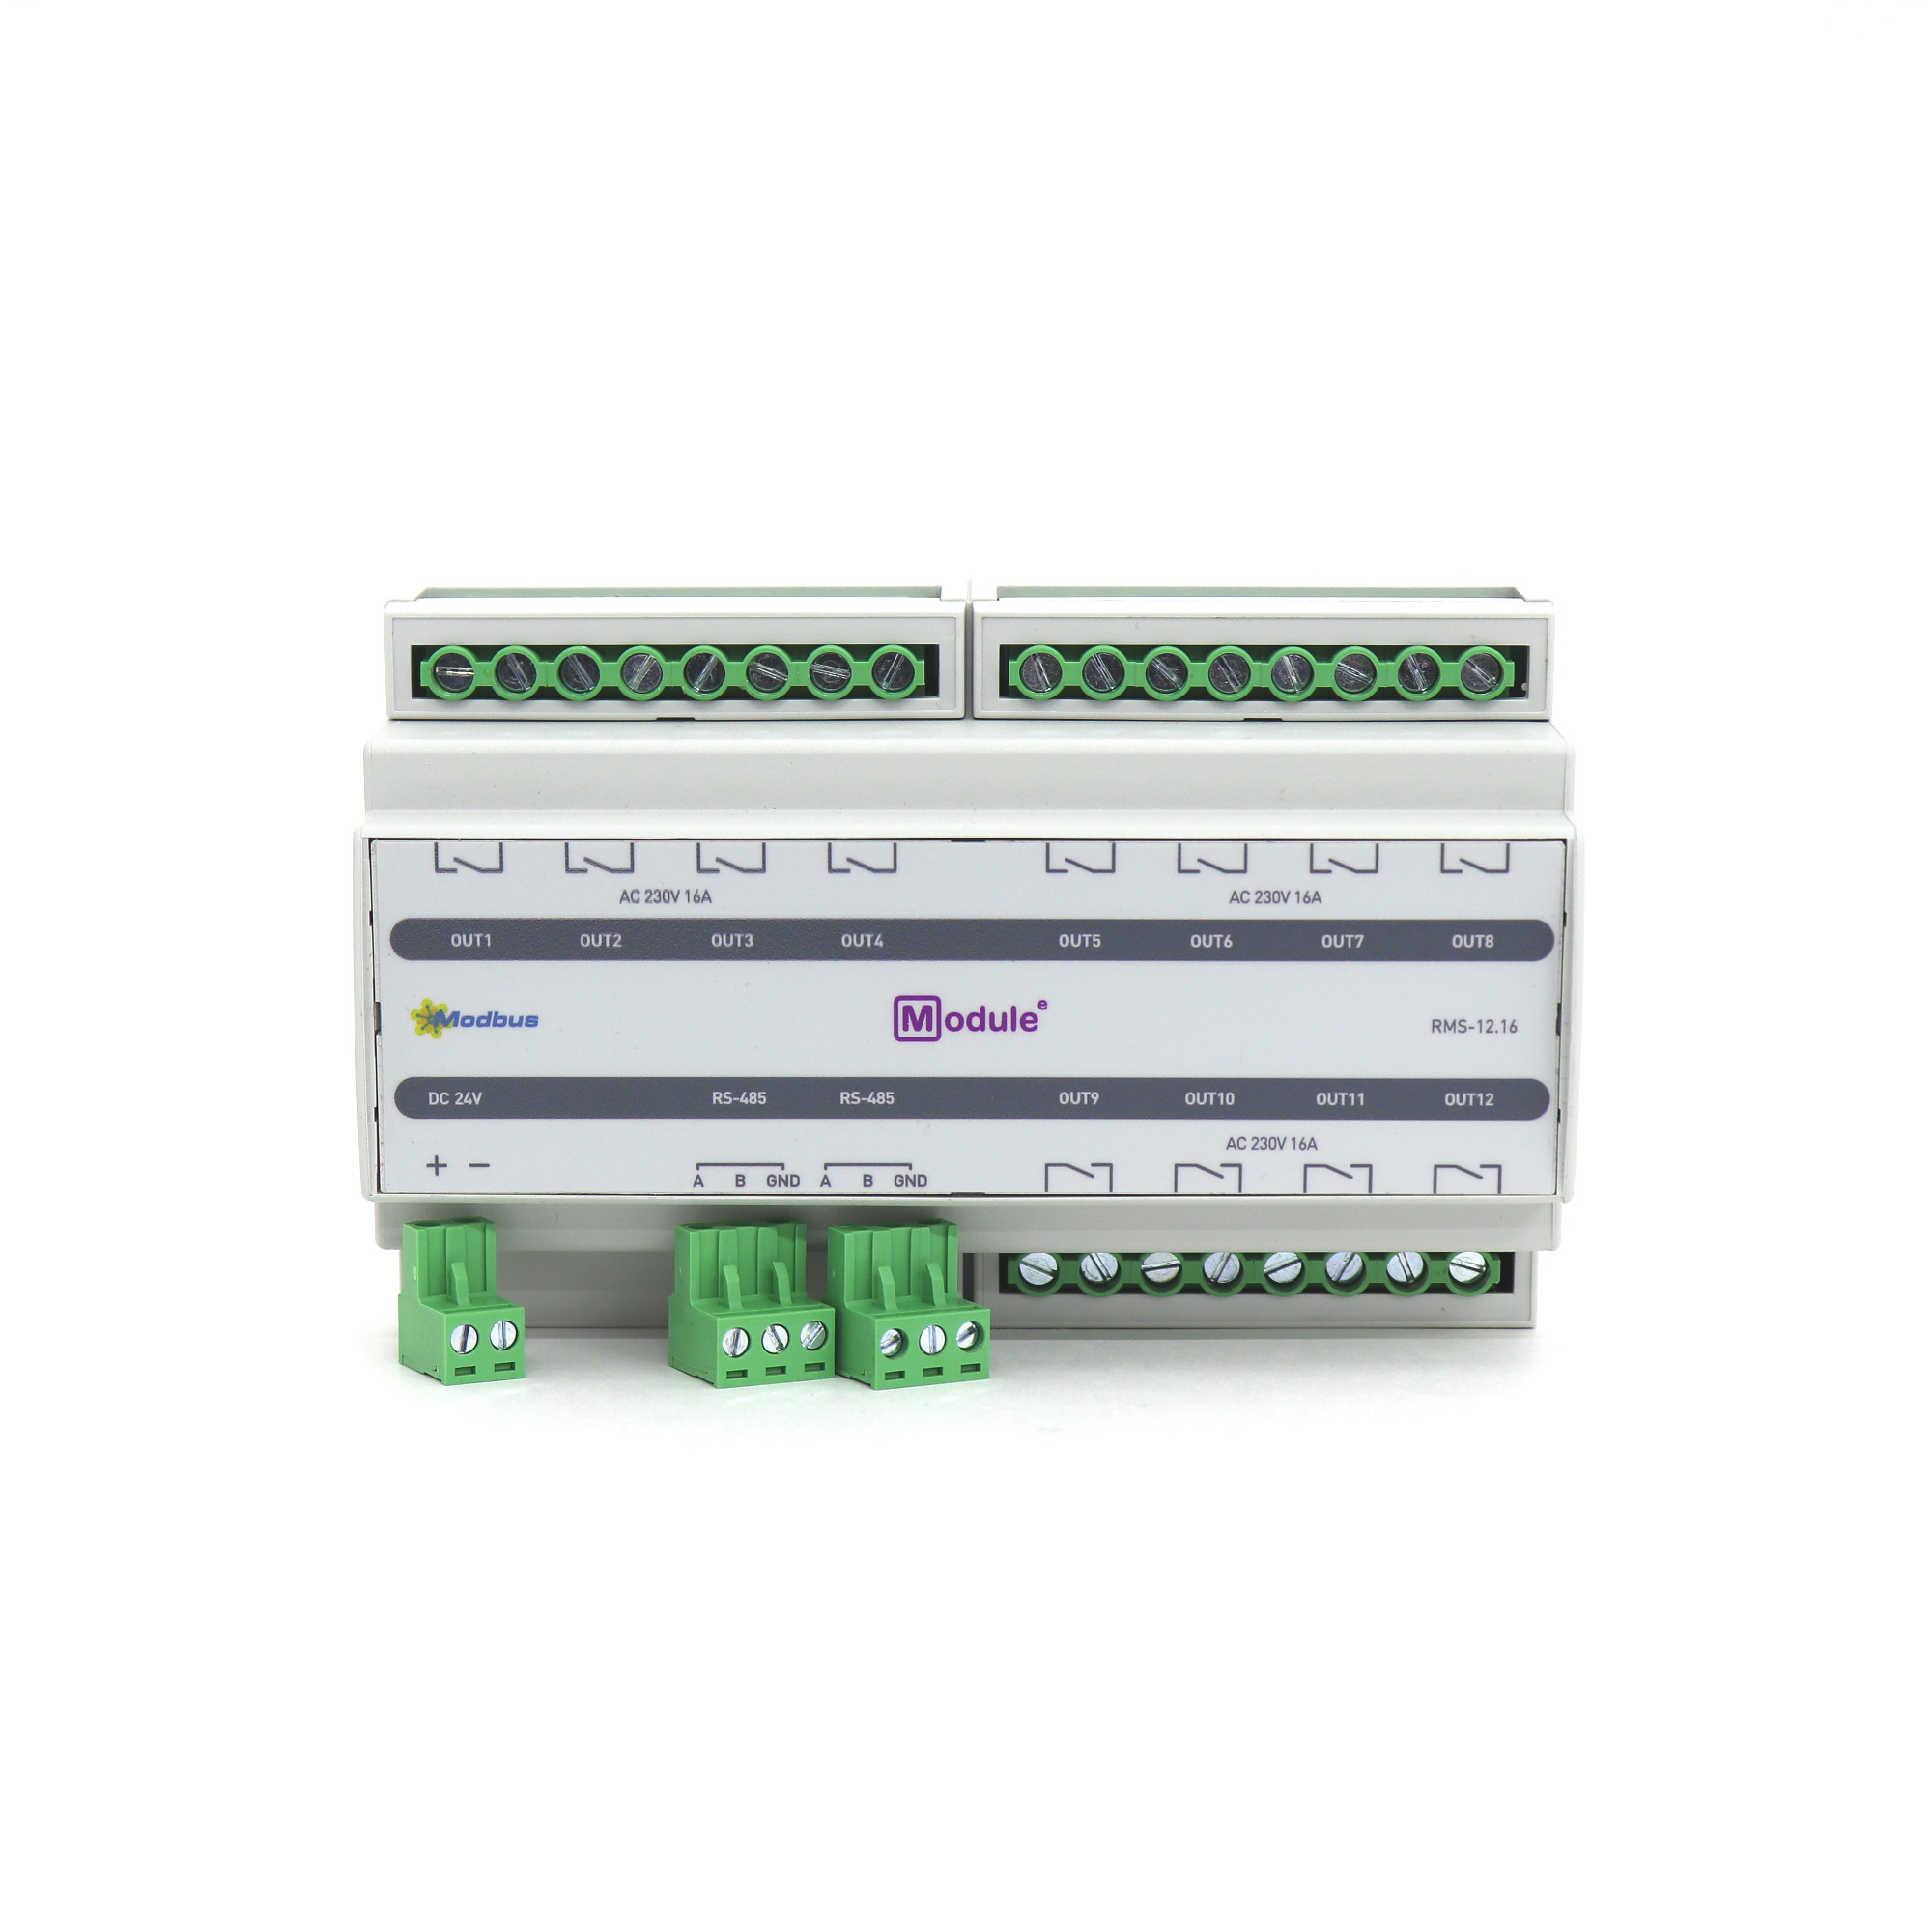 RMS-12.16, Modbus модуль дискретного вывода, 12 каналов 16А